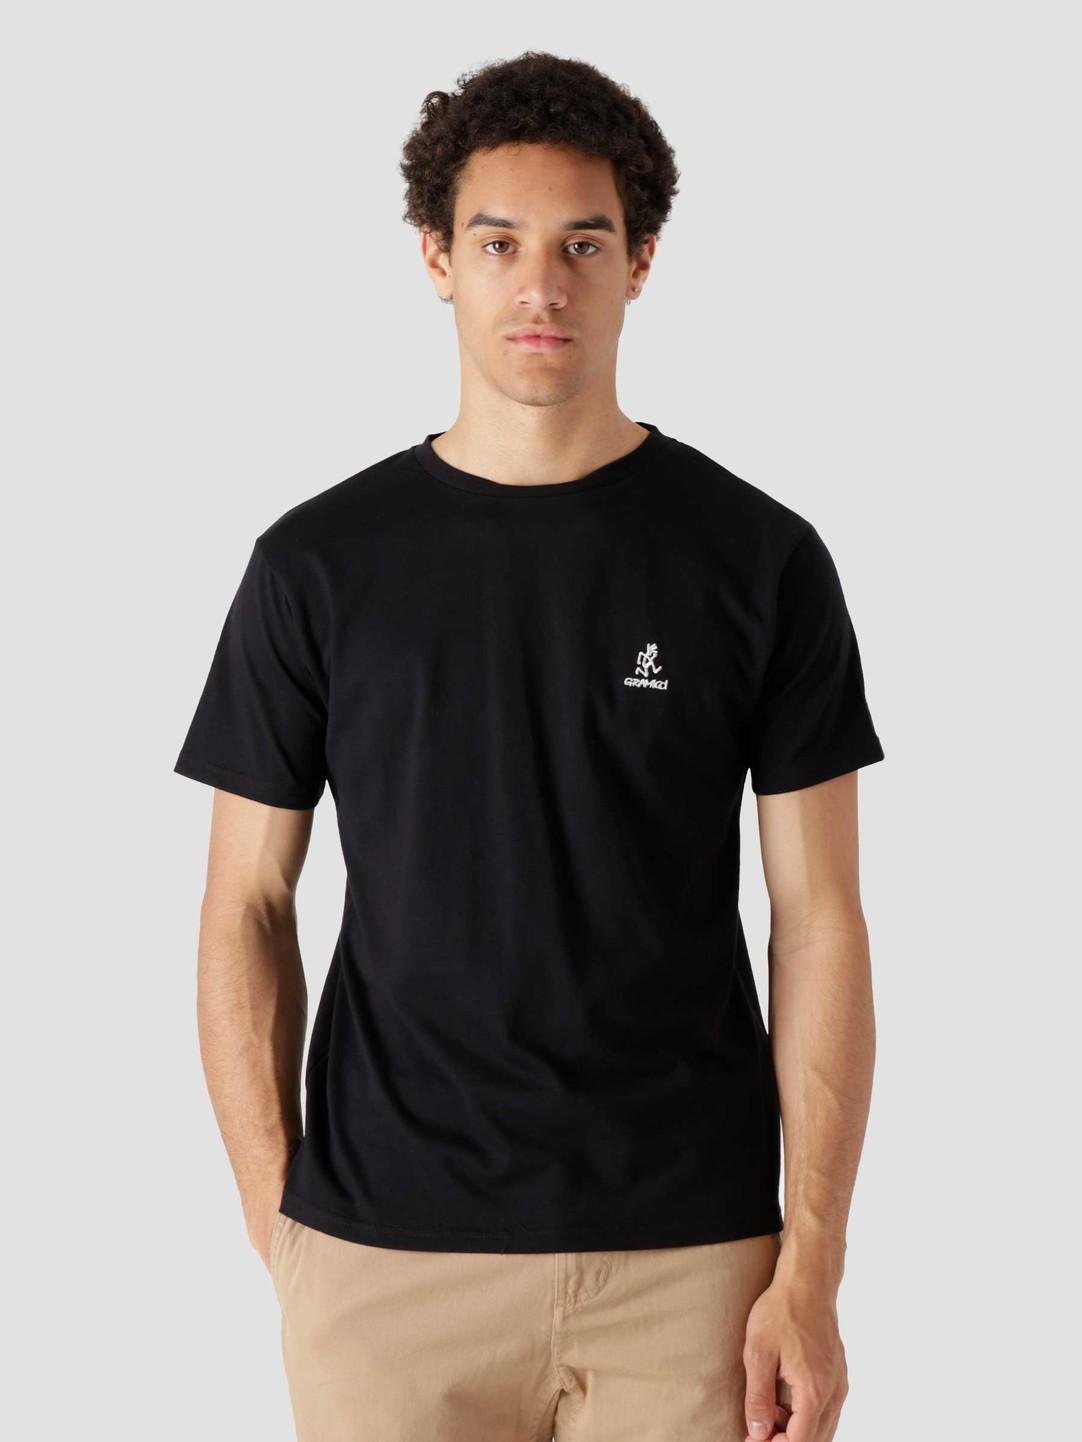 Gramicci Gramicci Big Runningman T-shirt Black 2013-STS